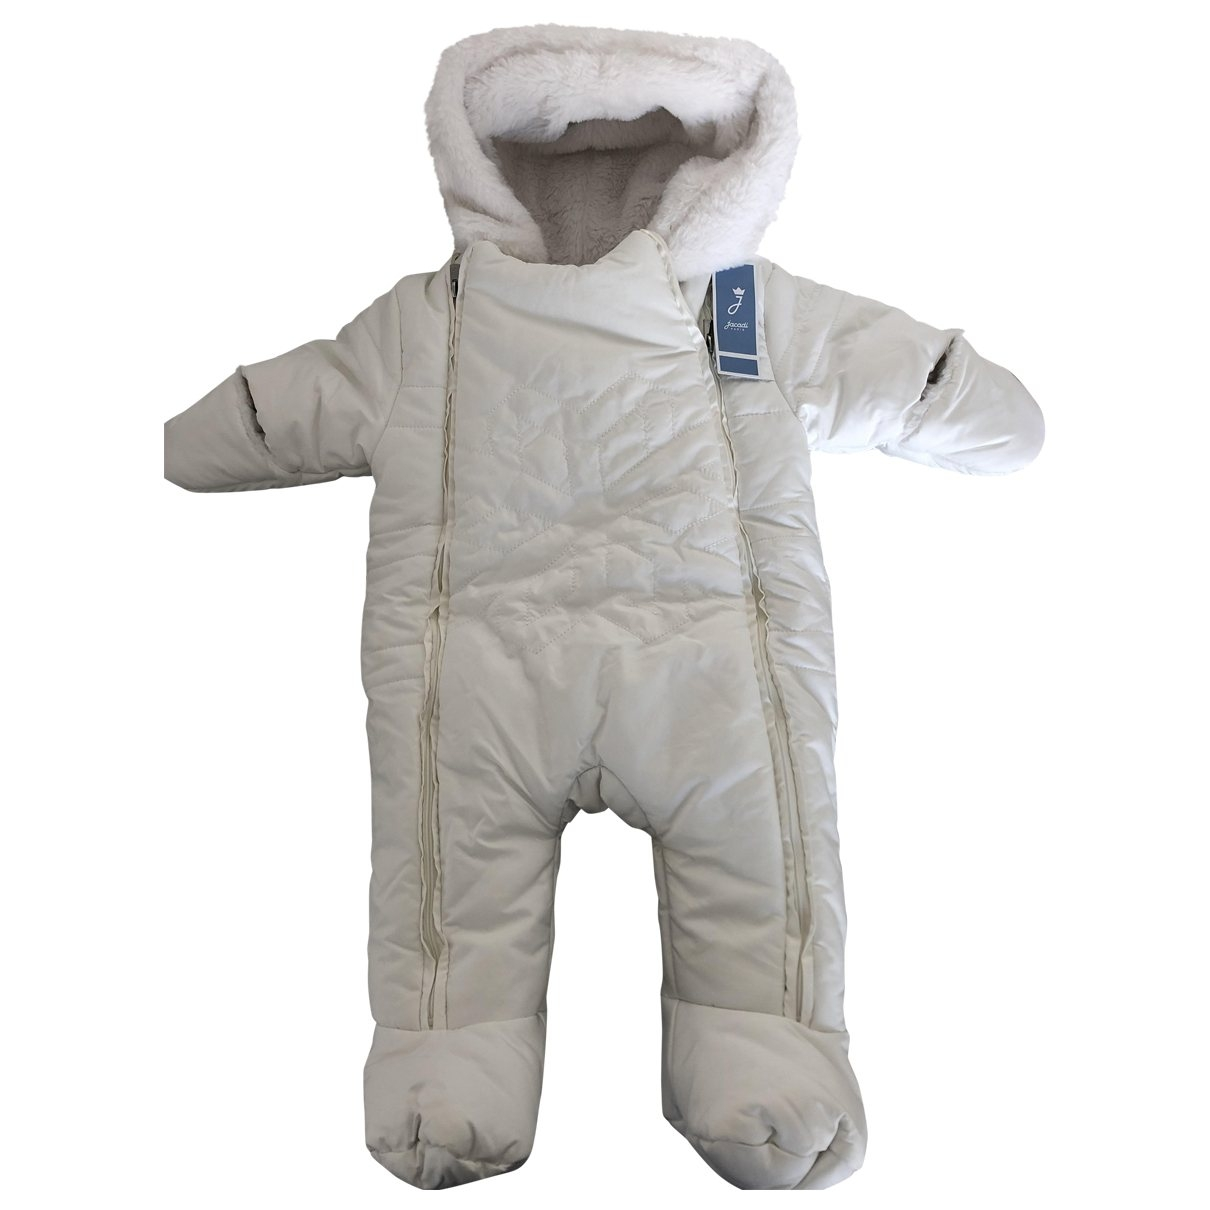 Jacadi \N White jacket & coat for Kids 3 months - up to 60cm FR